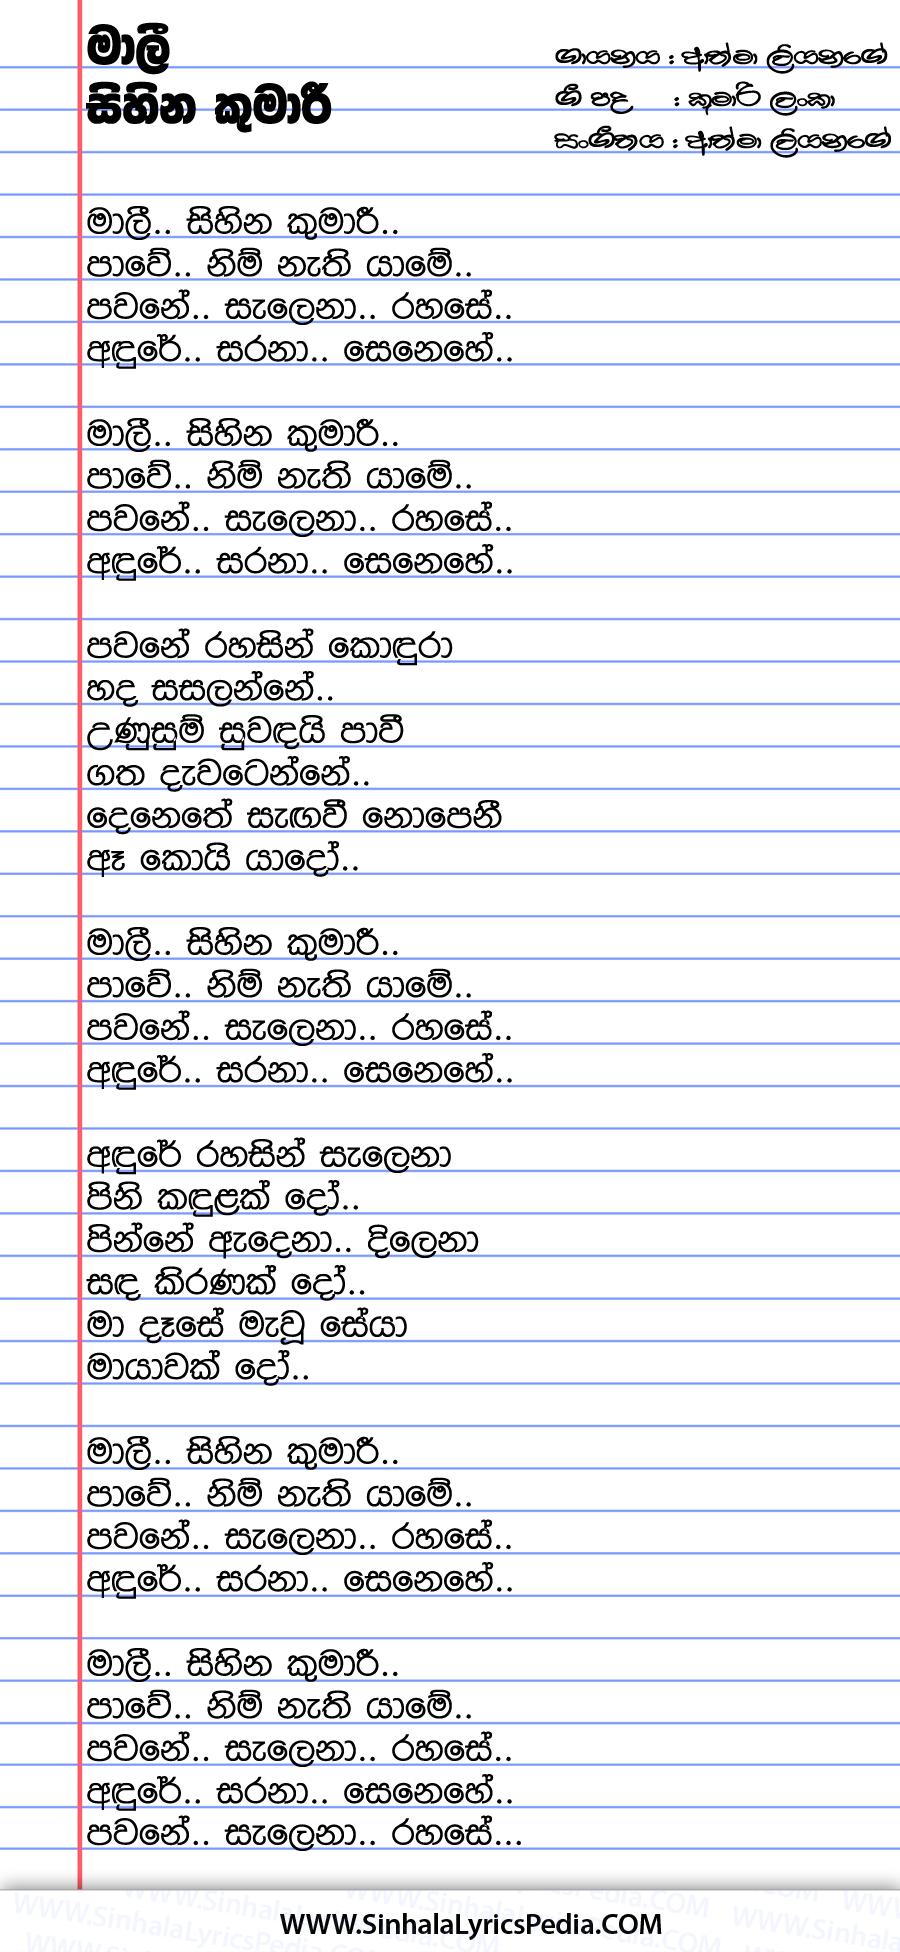 Malee Sihina Kumari Song Lyrics